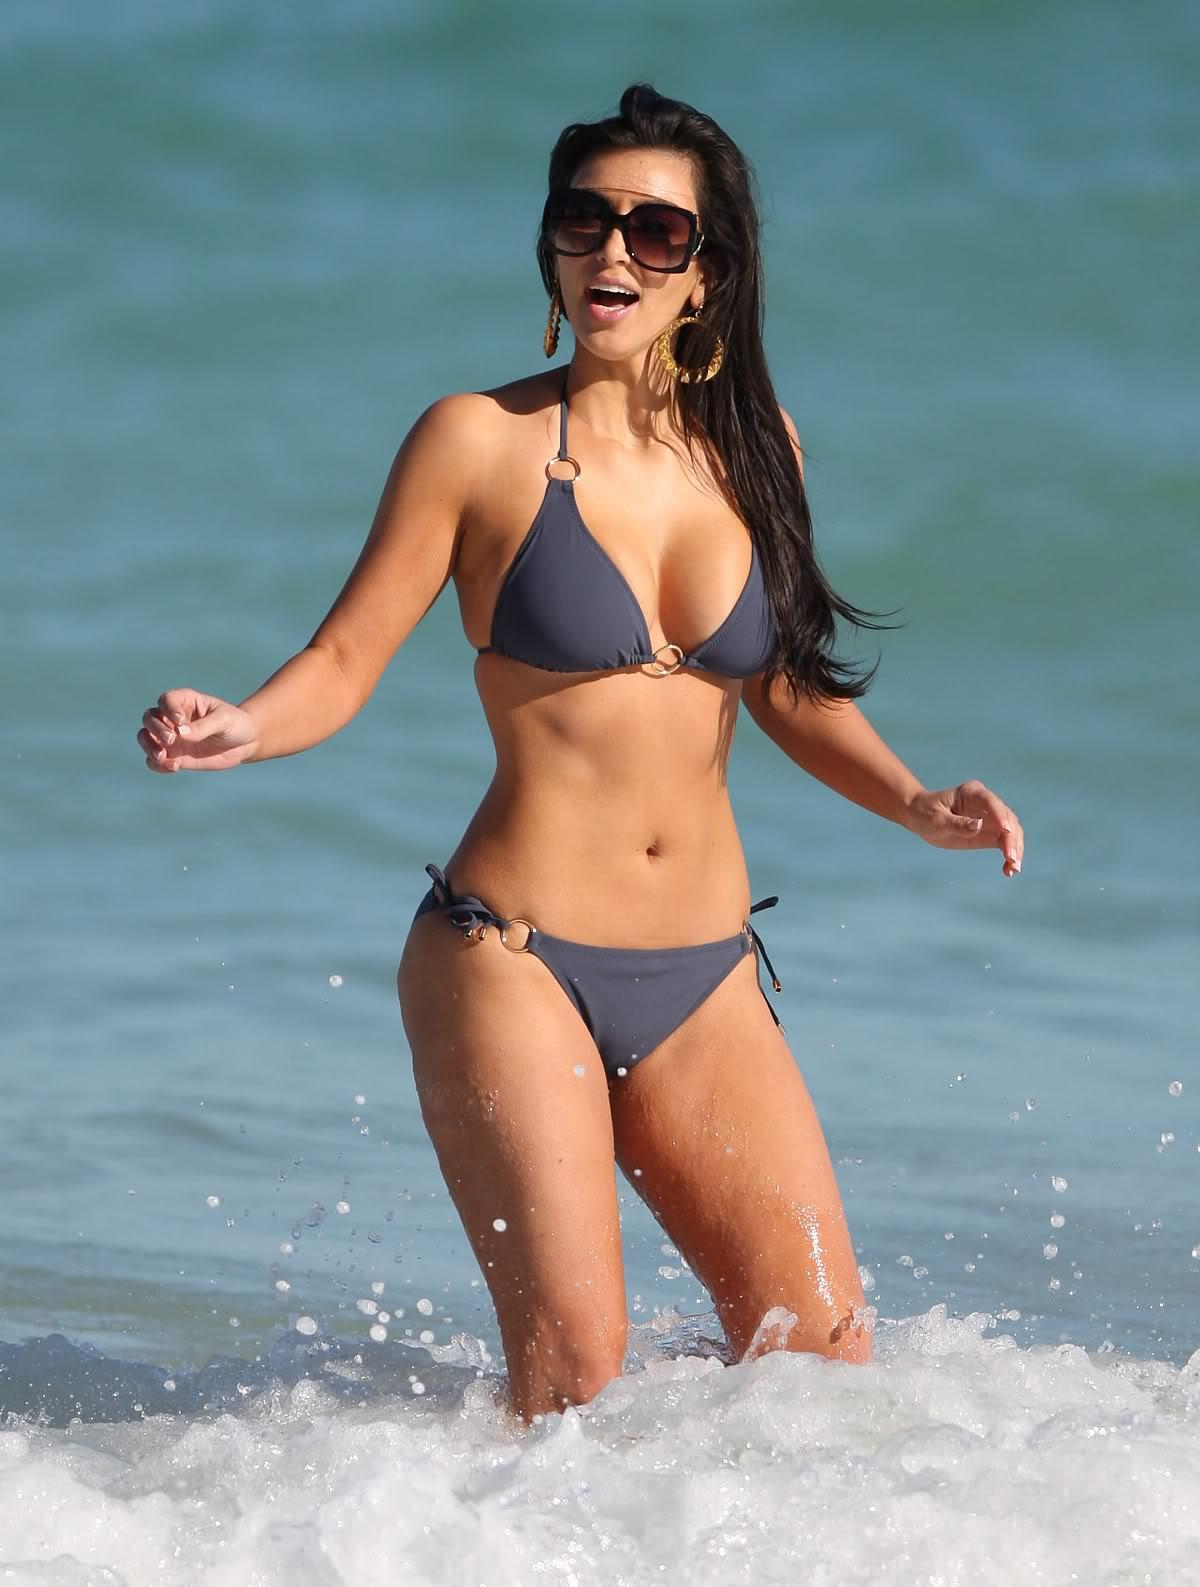 http://1.bp.blogspot.com/_rQUwGQsZx-Y/TKZ6jzF5kwI/AAAAAAAAAhA/MvP6SWltevo/s1600/kim-kardashian-03.jpg